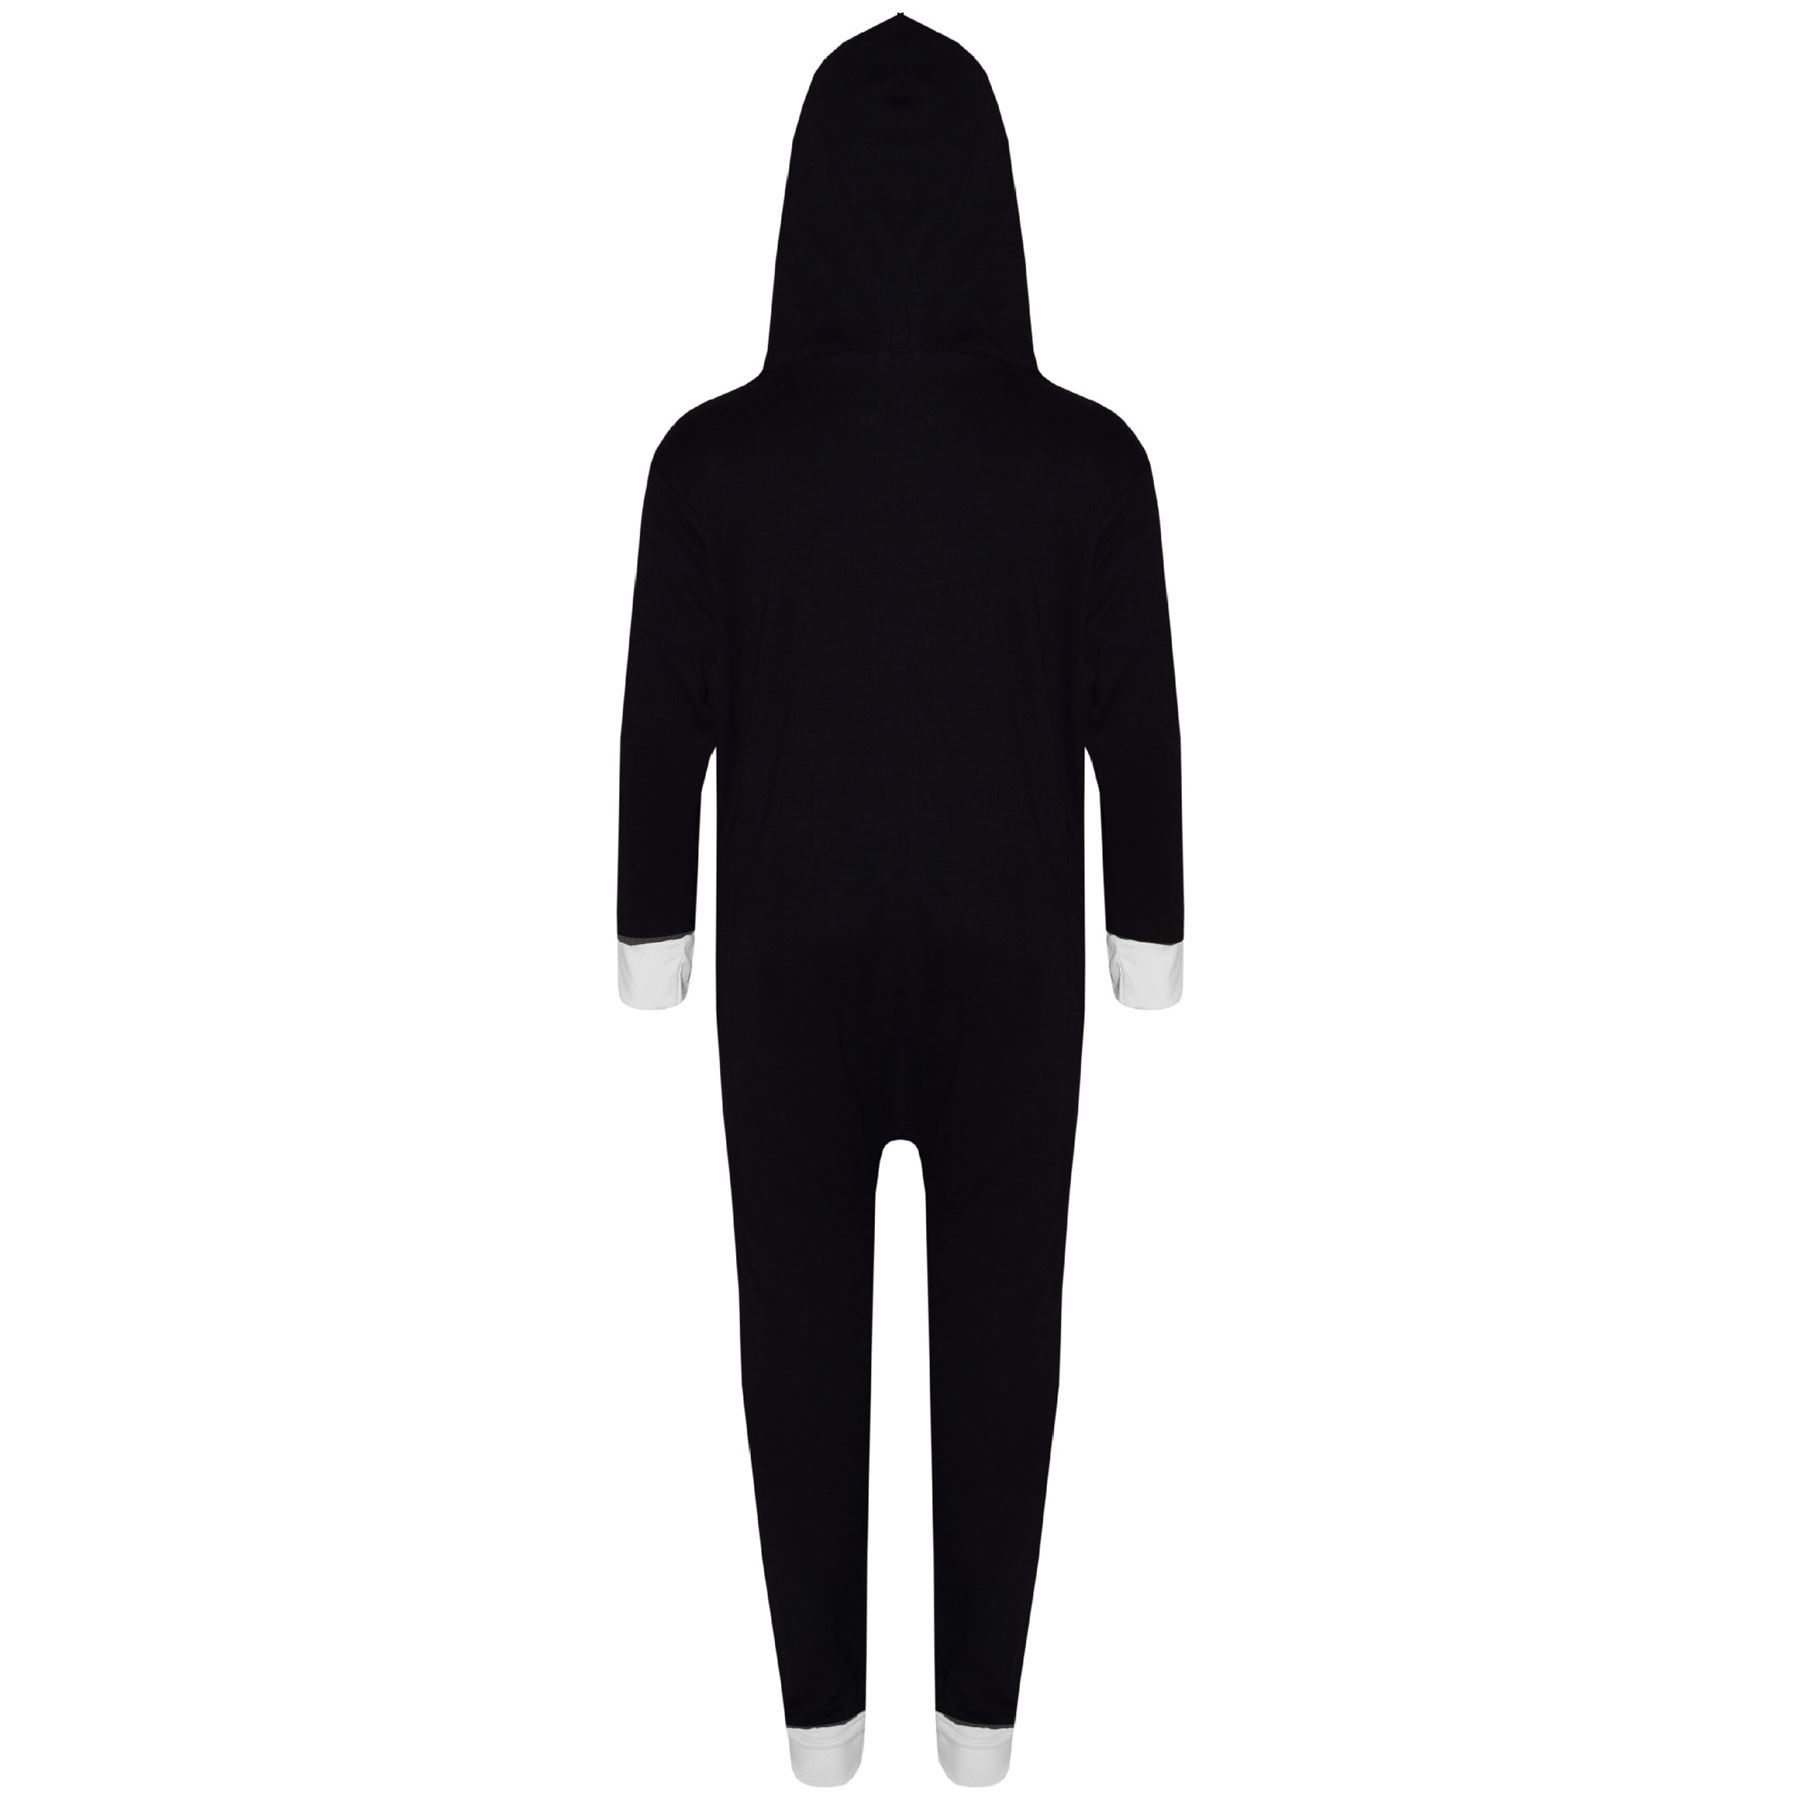 Bambini Ragazzi Ragazze Skeleton Stampa A2Z TUTINA UN PEZZO Costume Di Halloween 5-13 anni